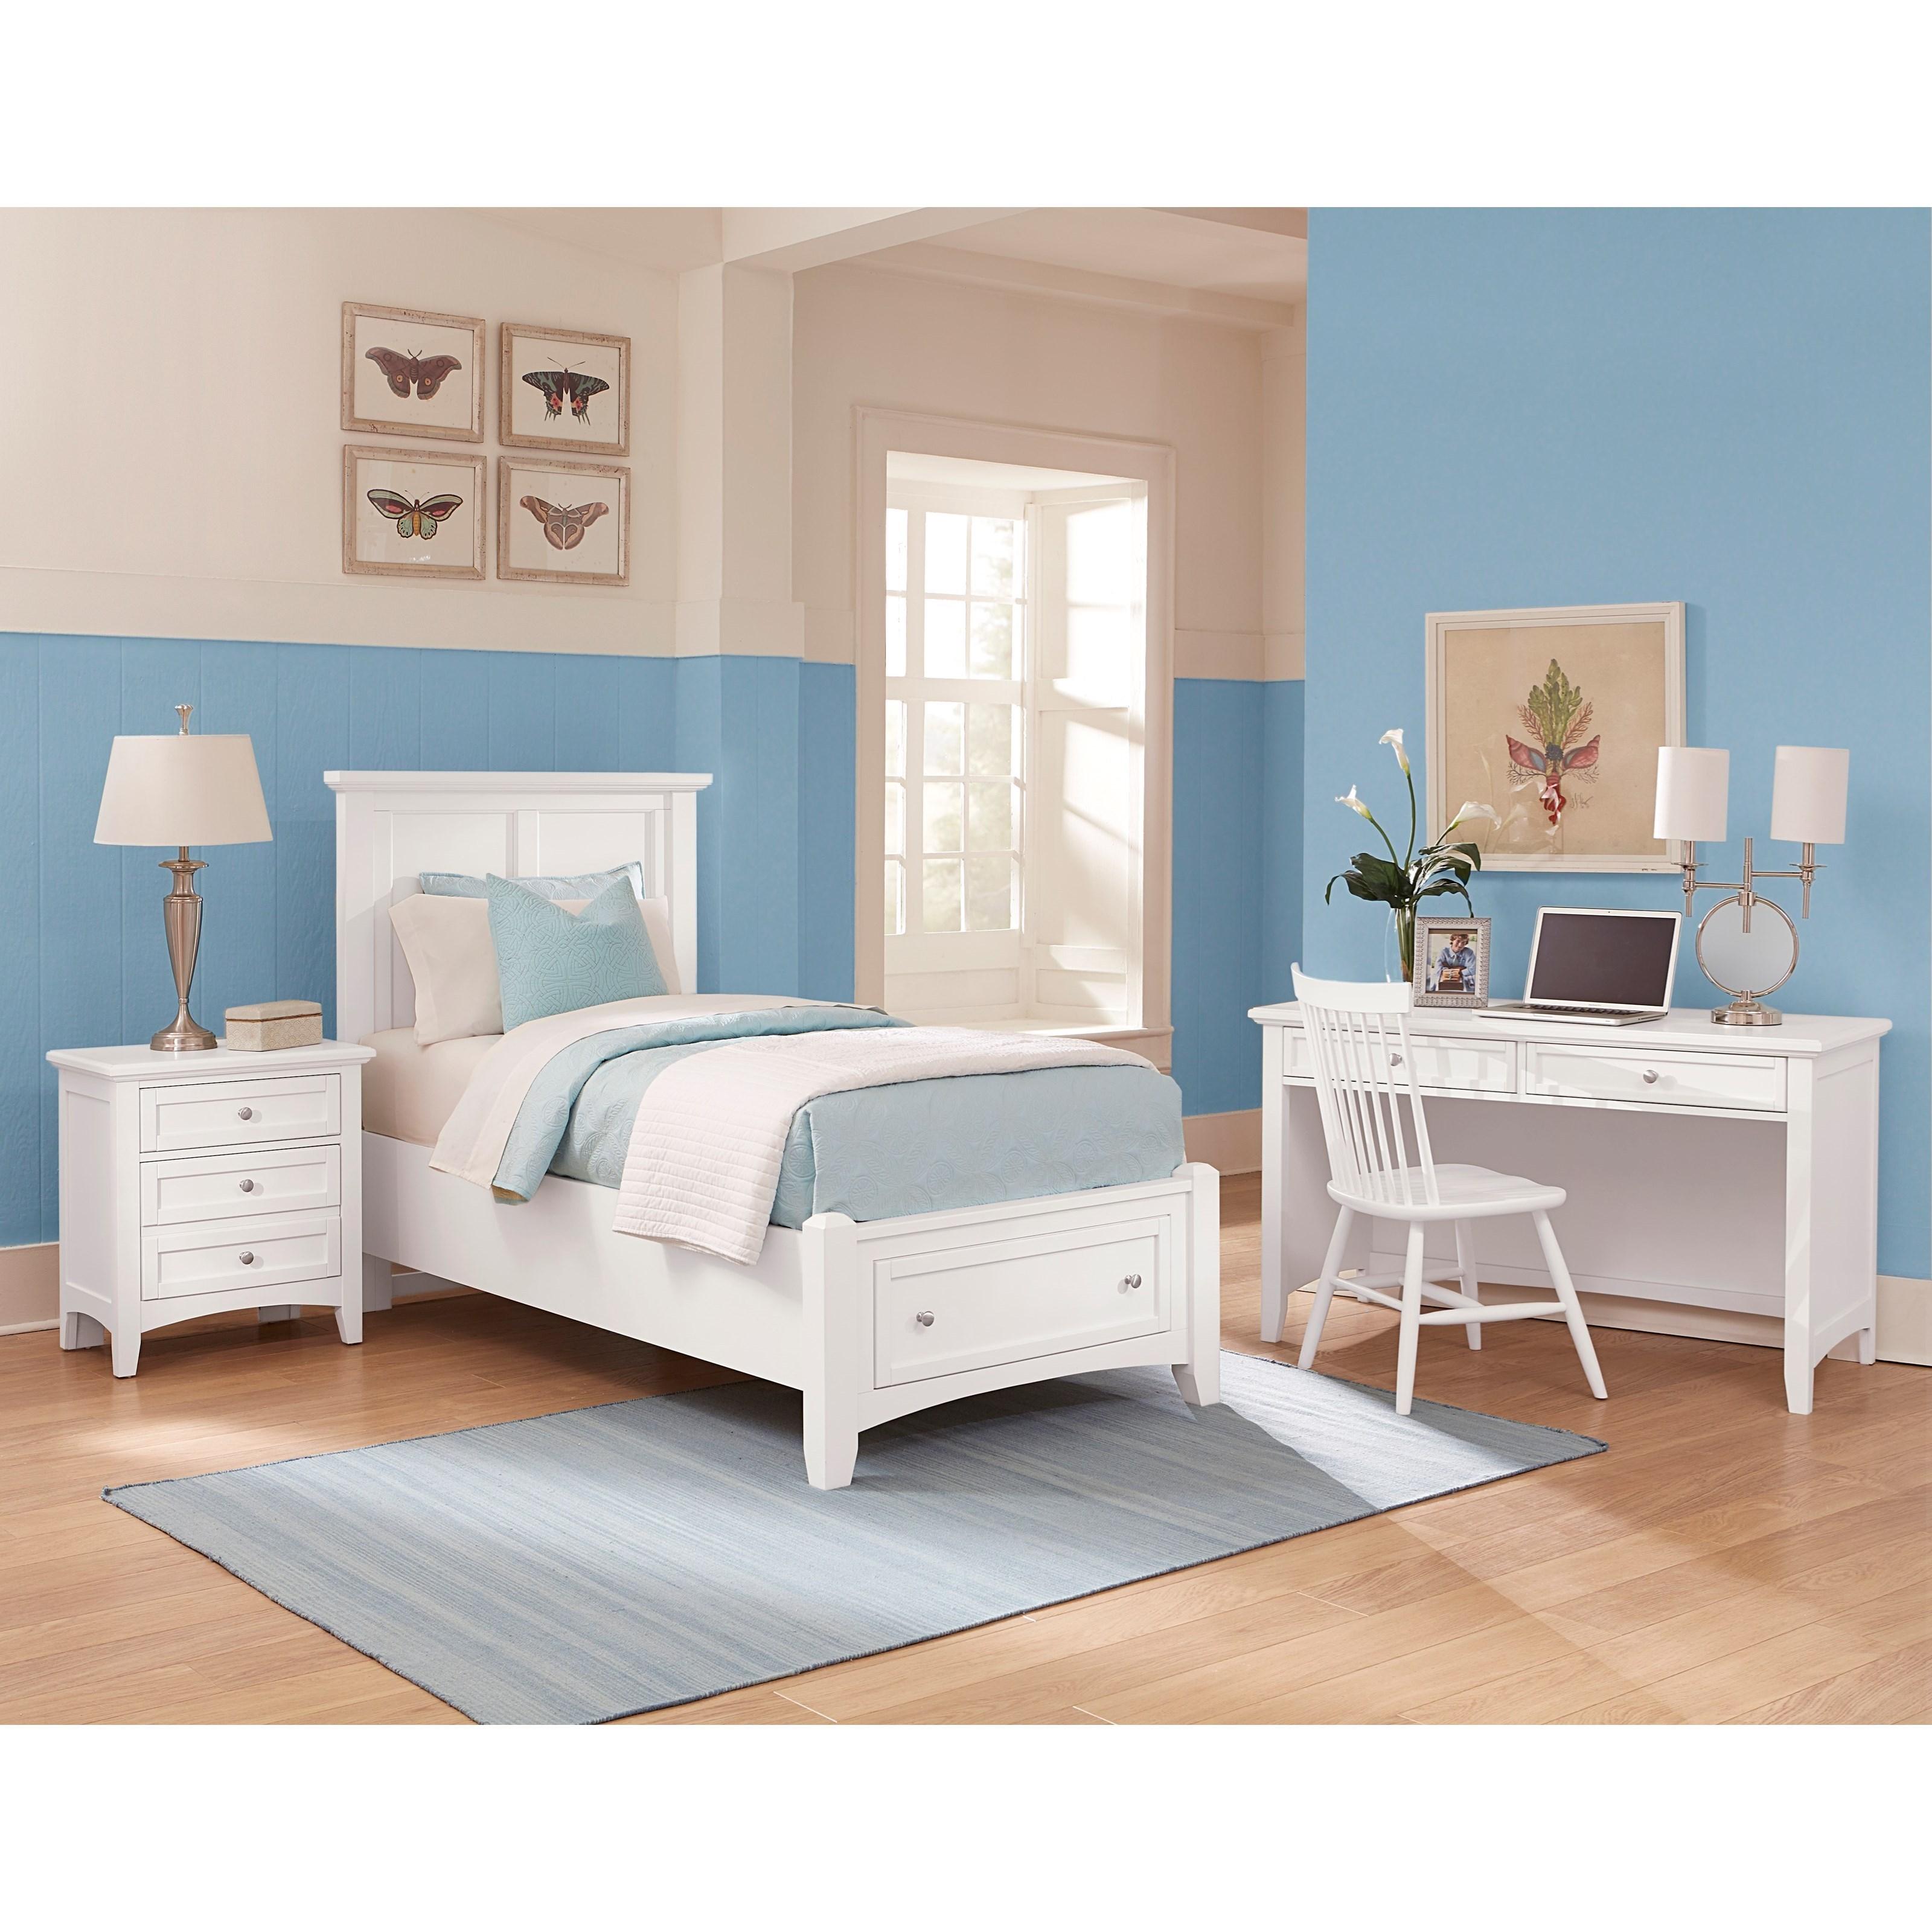 vaughan bassett bonanza twin bedroom group hudson 39 s furniture bedroom groups. Black Bedroom Furniture Sets. Home Design Ideas